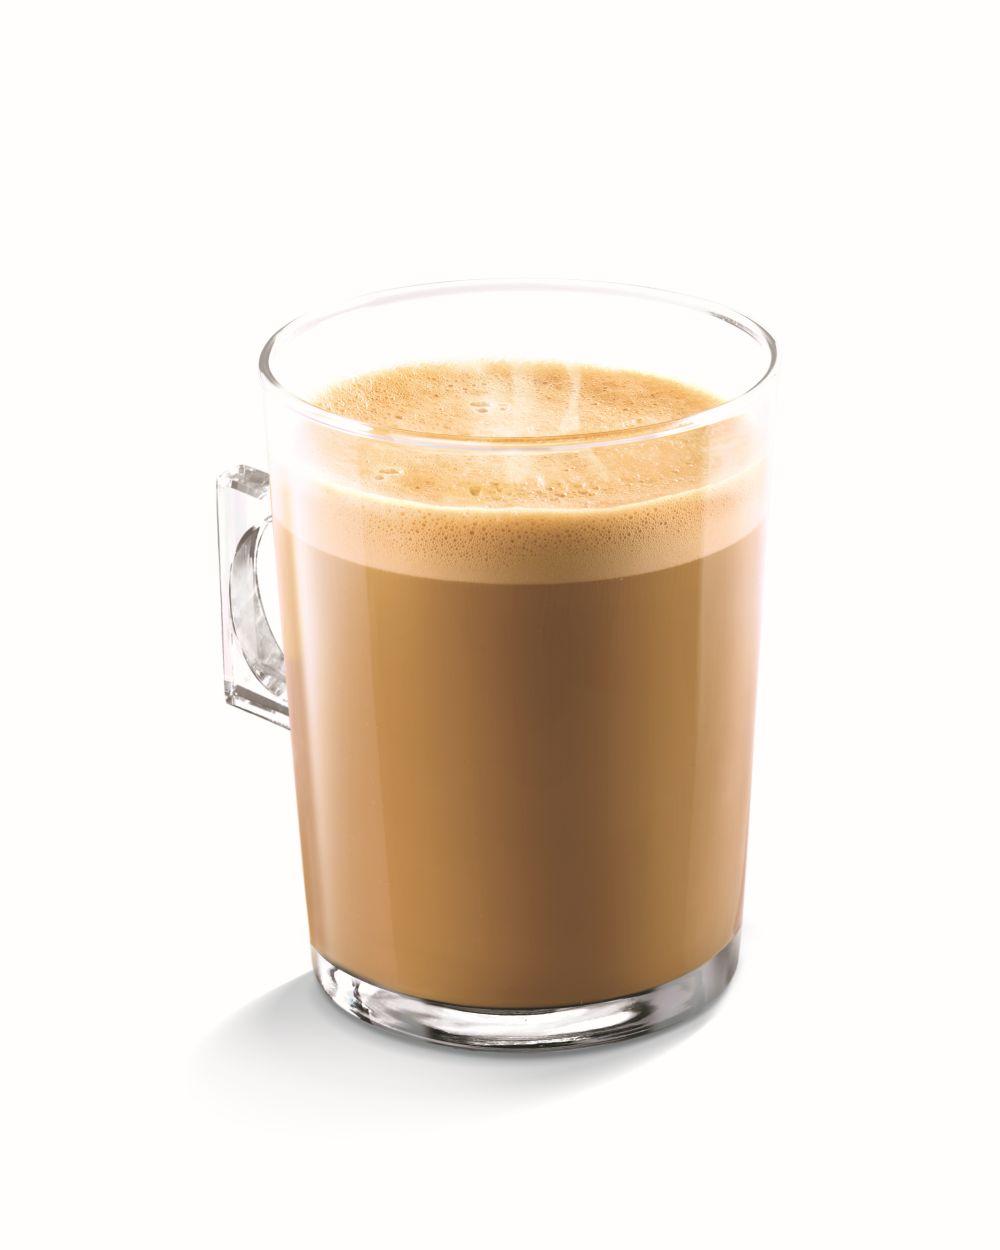 nescafe dolce gusto cafe au lait 16 coffee pods capsules ebay. Black Bedroom Furniture Sets. Home Design Ideas